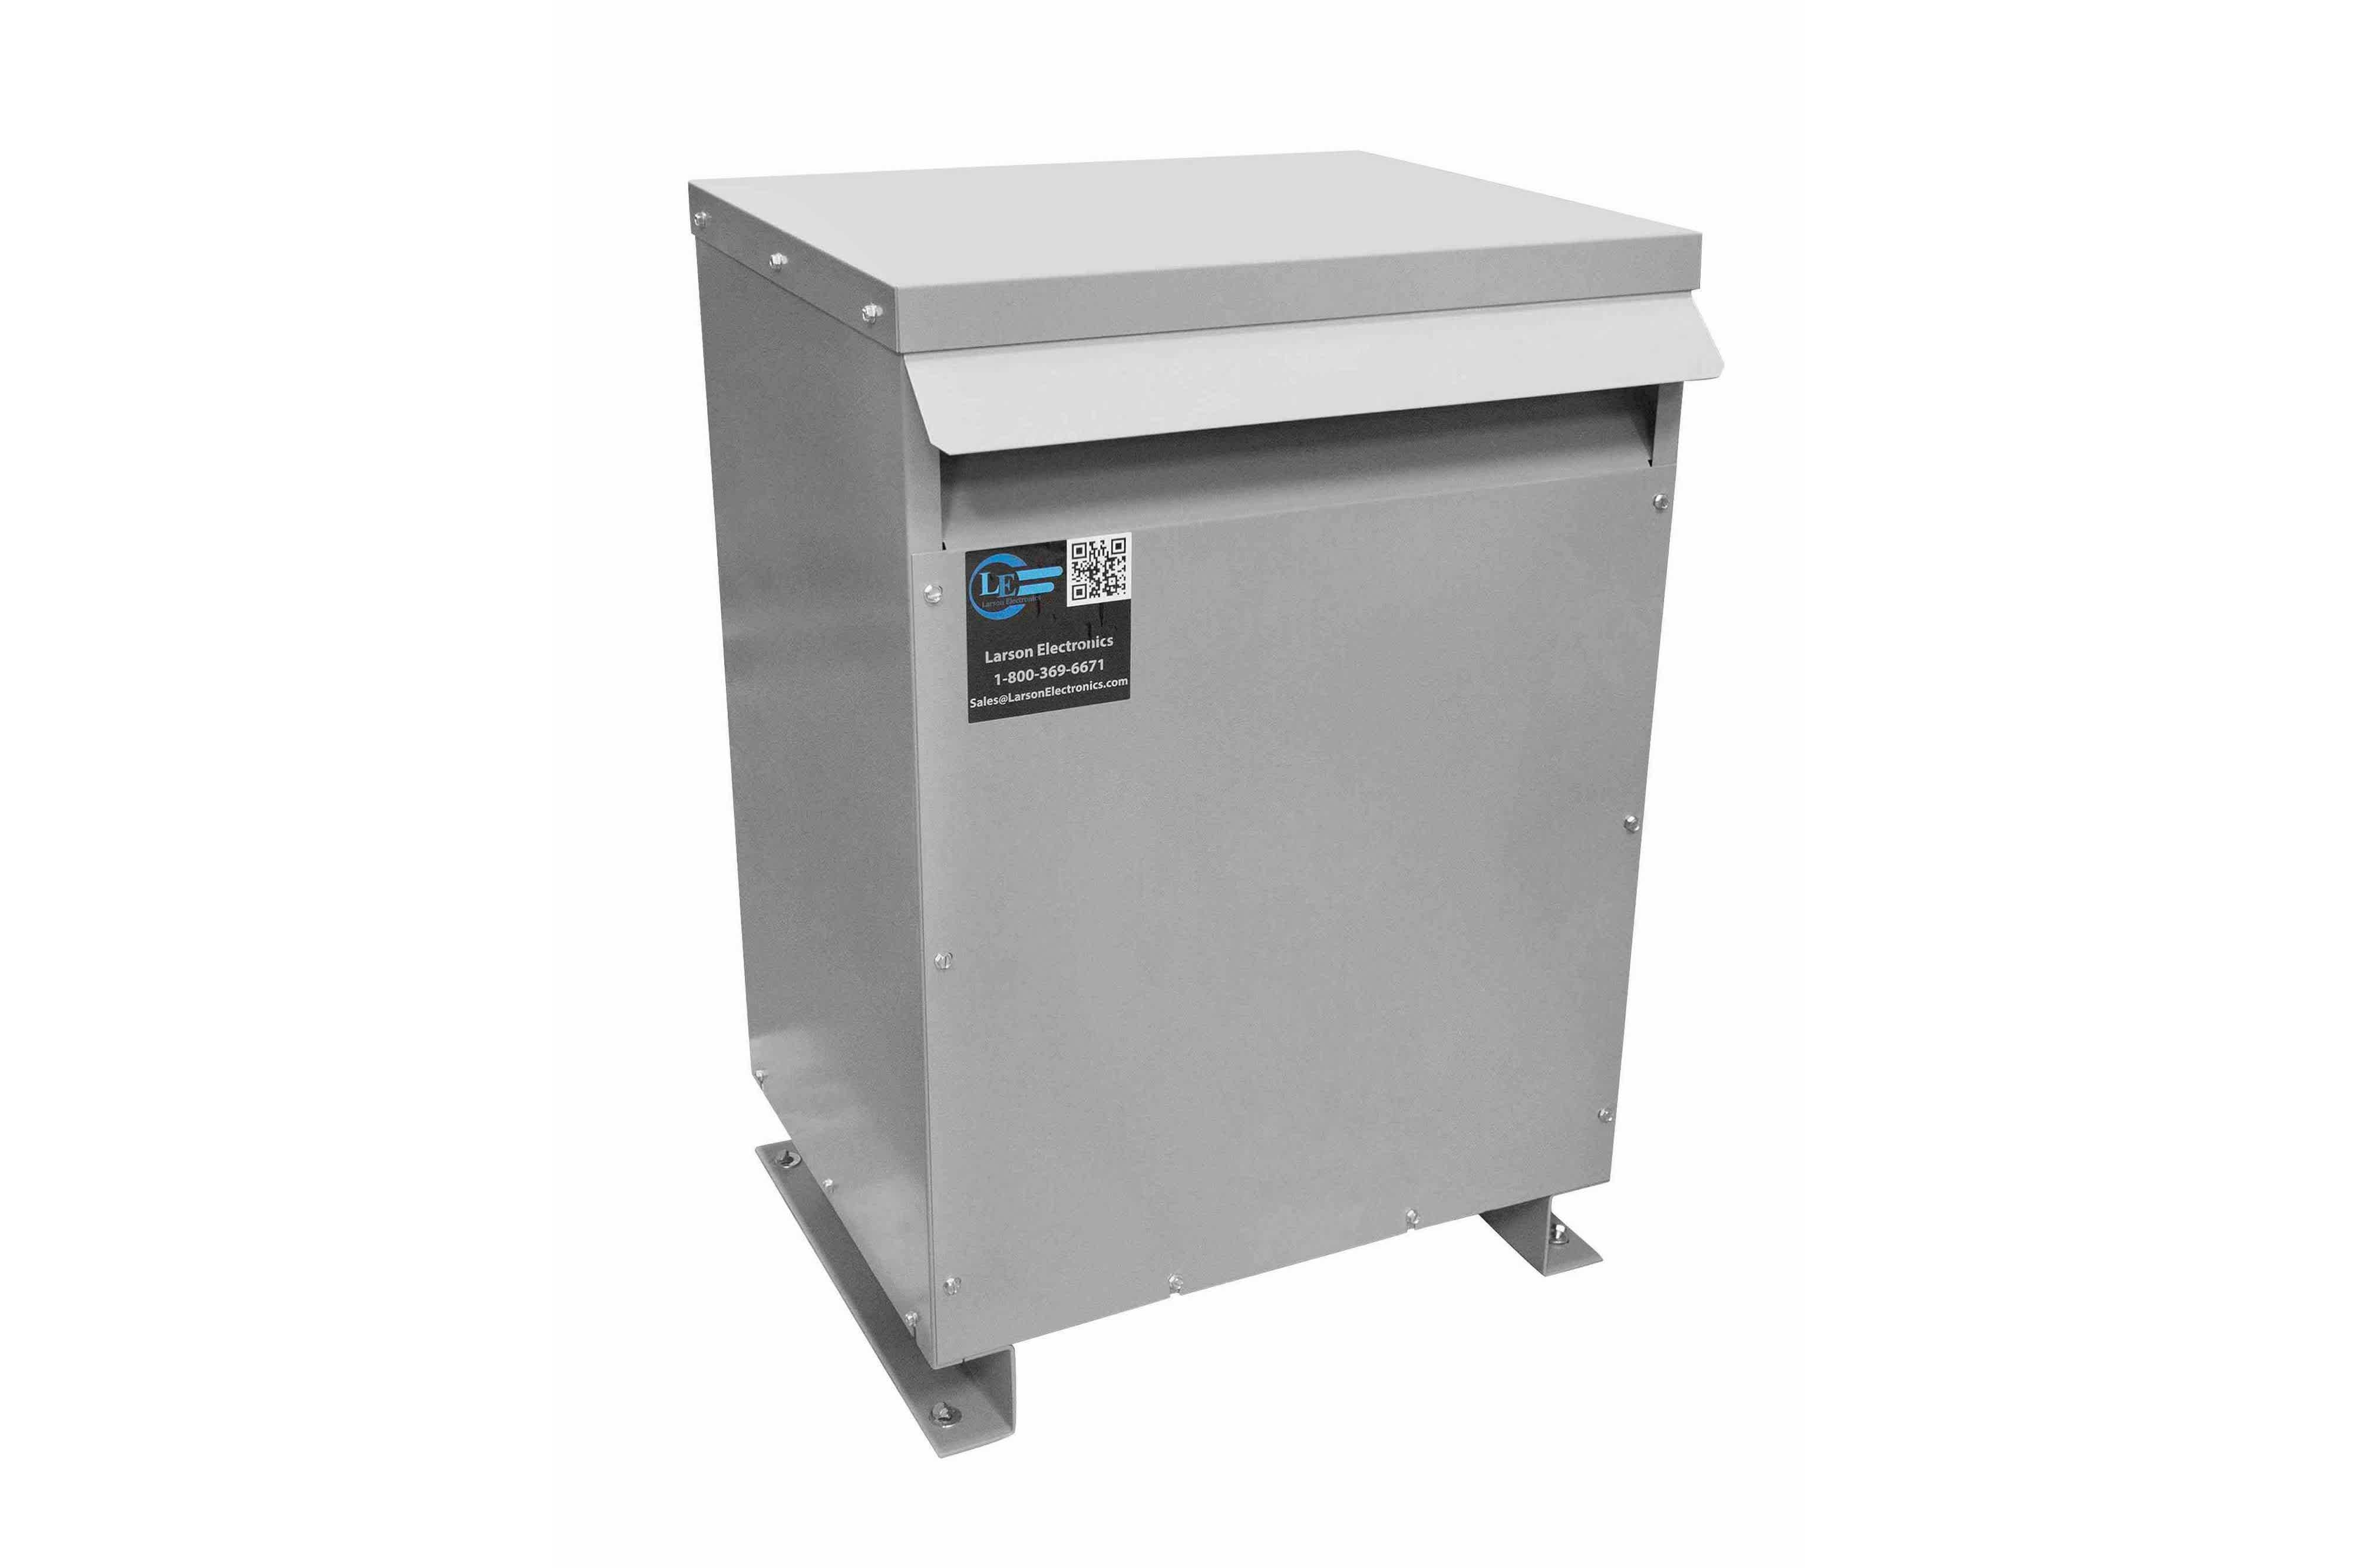 500 kVA 3PH Isolation Transformer, 208V Wye Primary, 380V Delta Secondary, N3R, Ventilated, 60 Hz